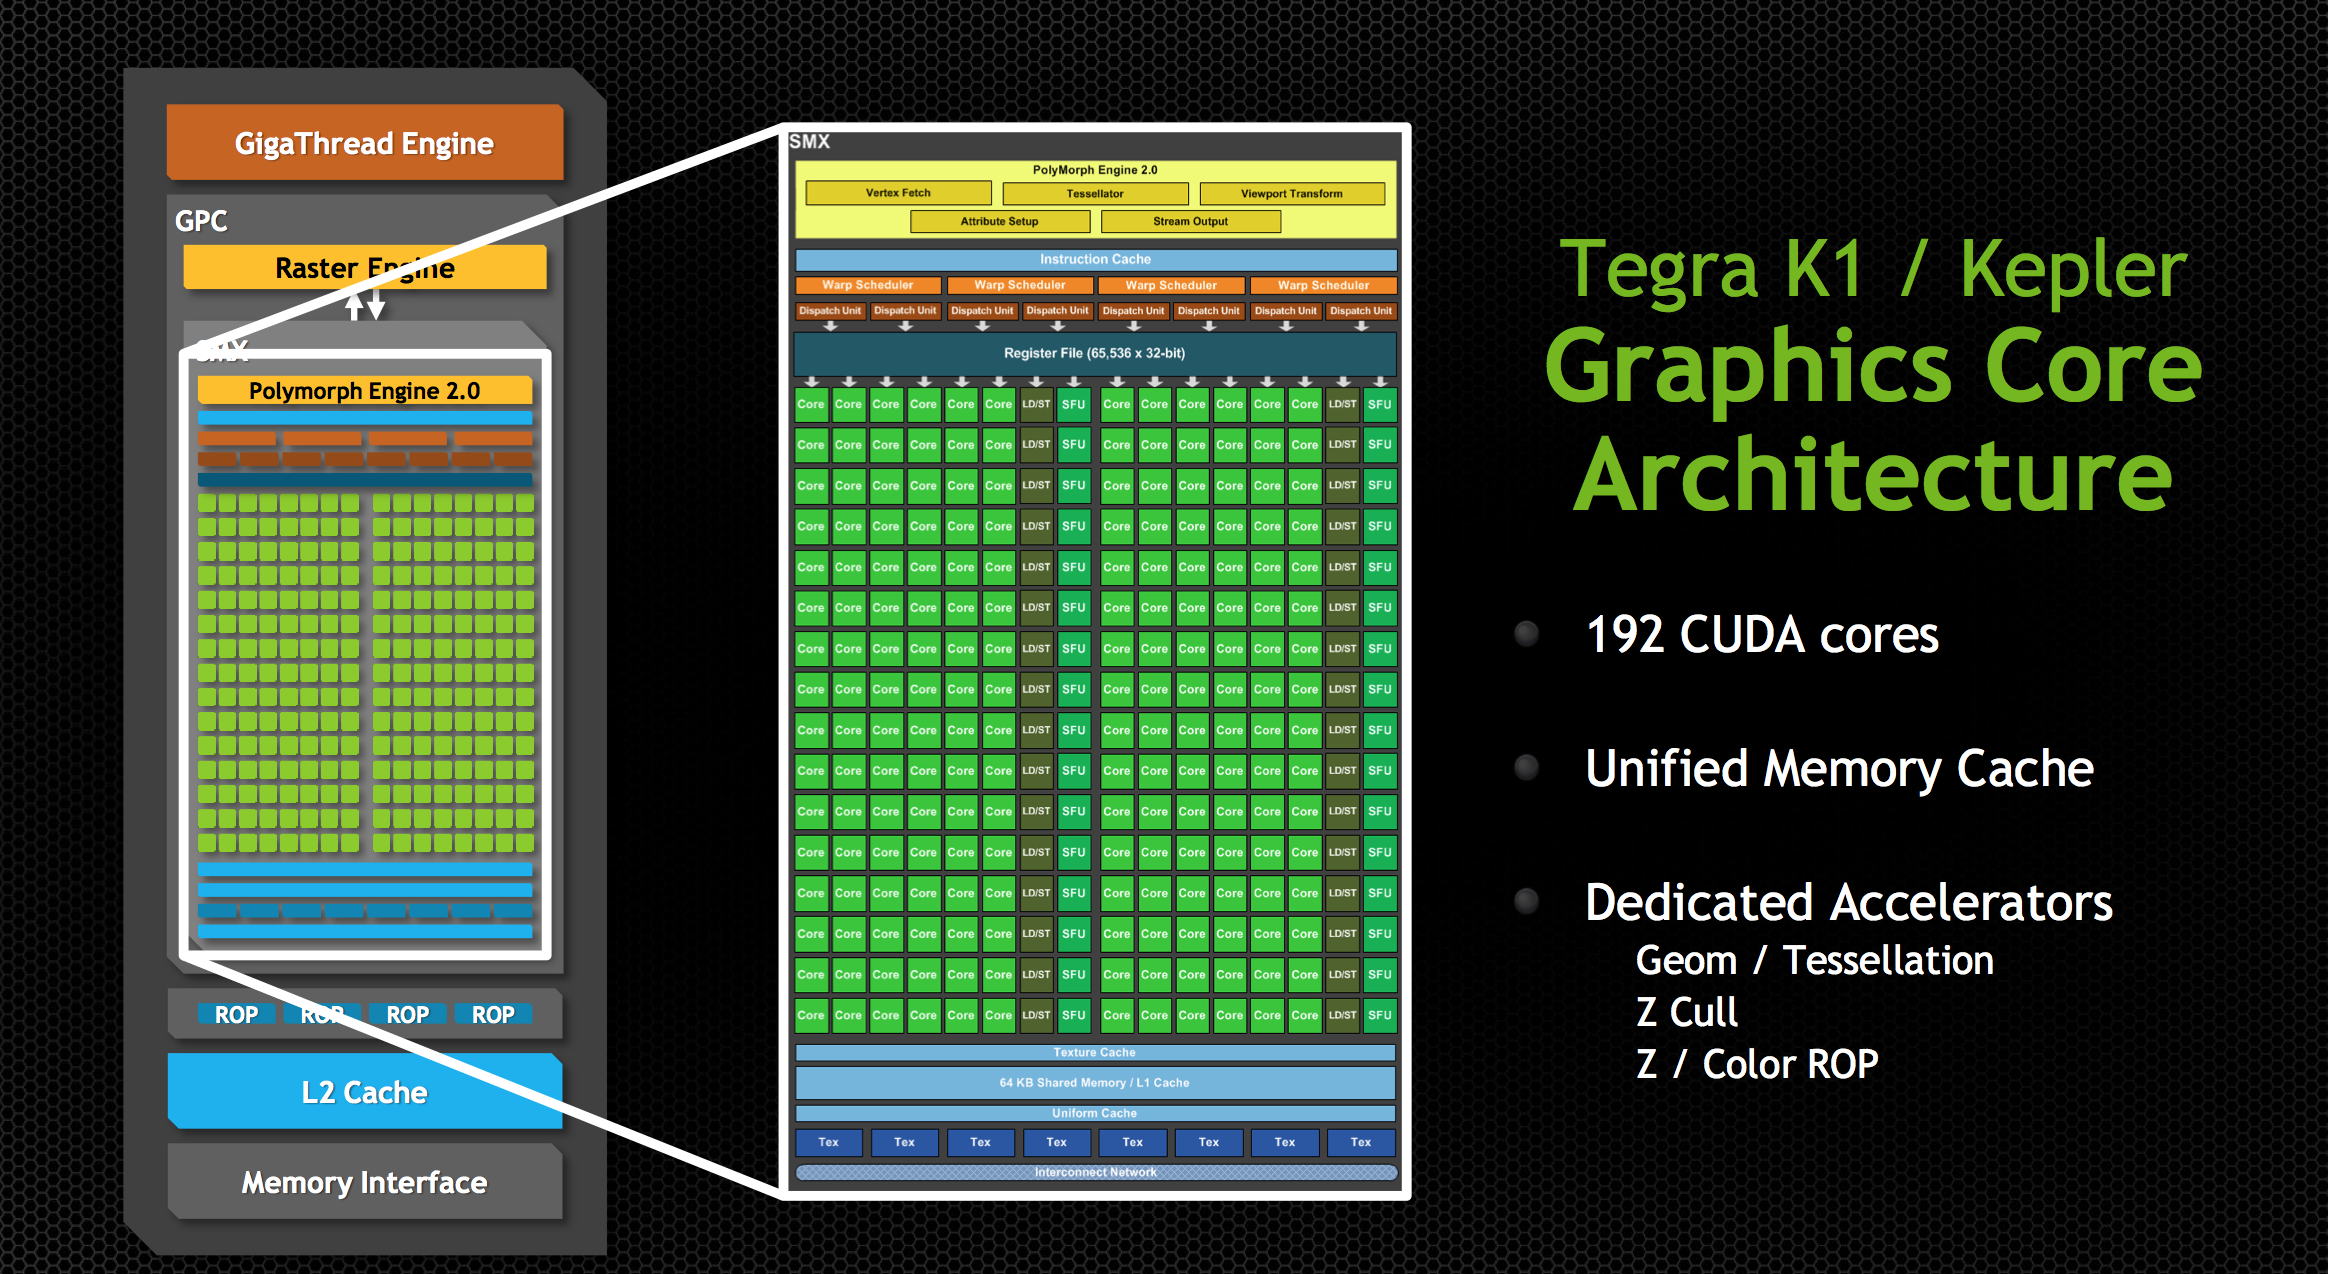 The GPU - NVIDIA Tegra K1 Preview & Architecture Analysis